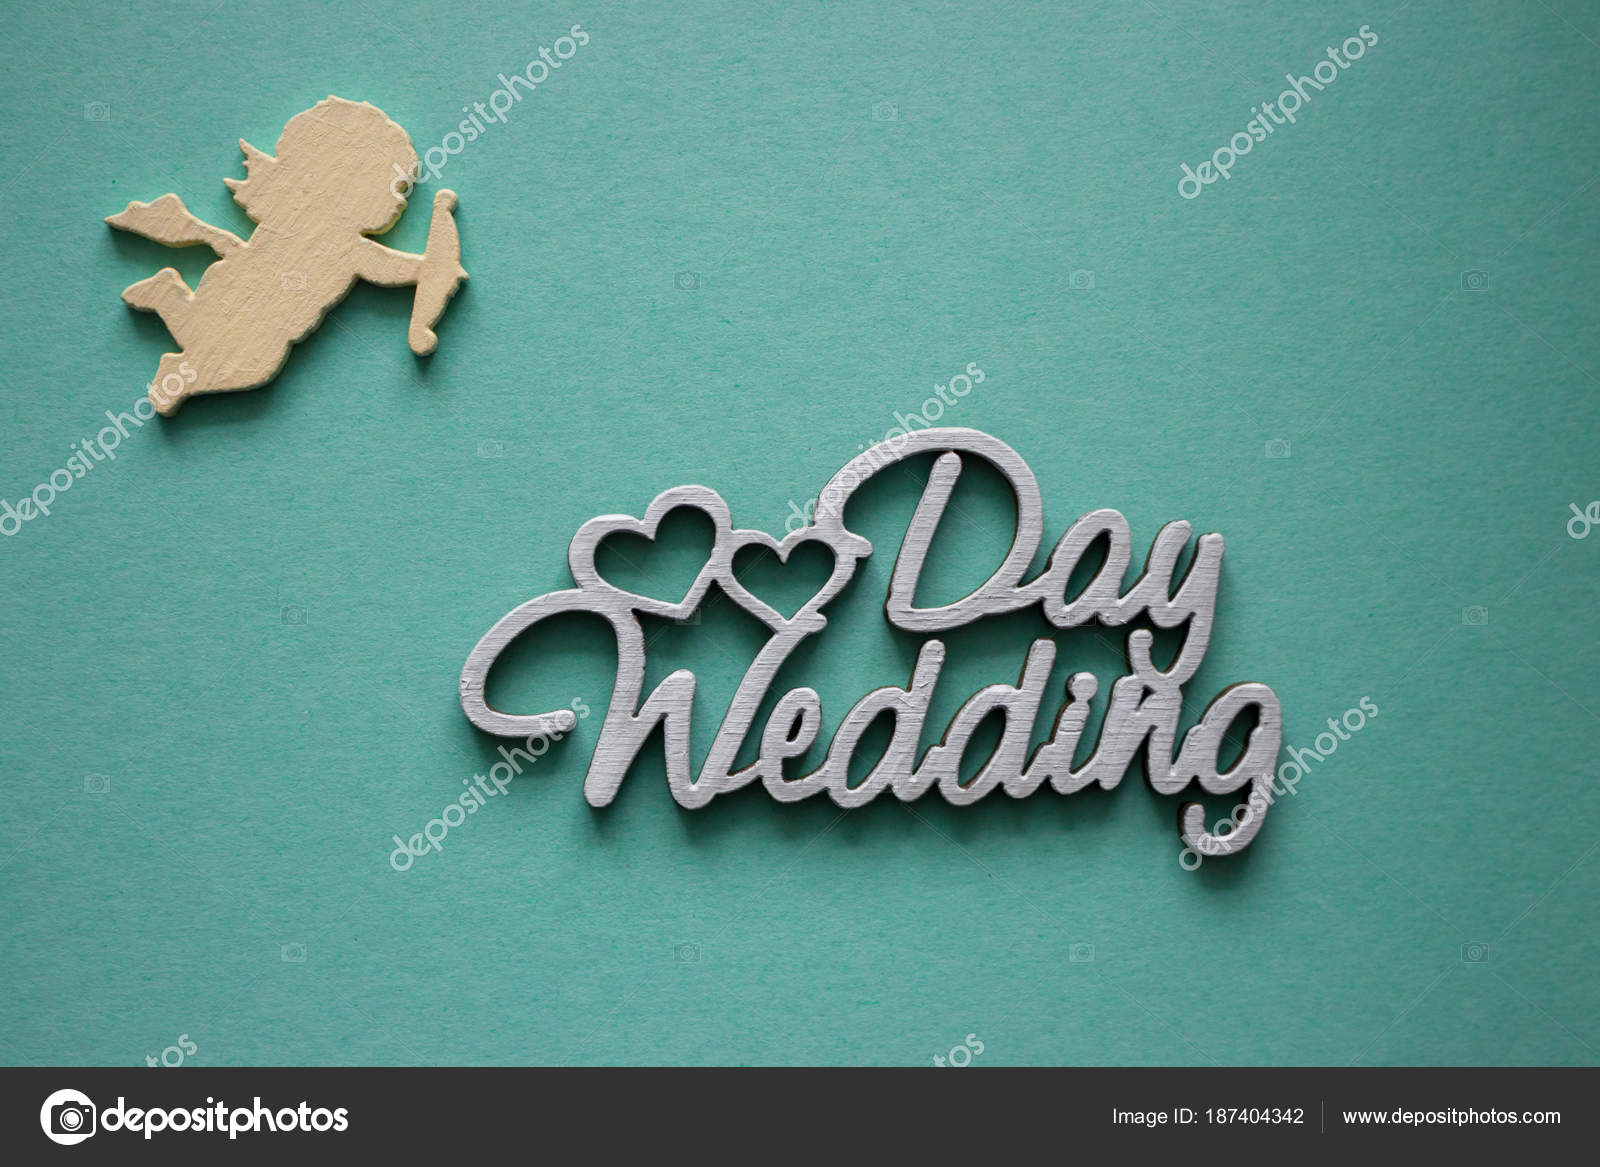 wedding greeting card words wedding day hearts love angel blue